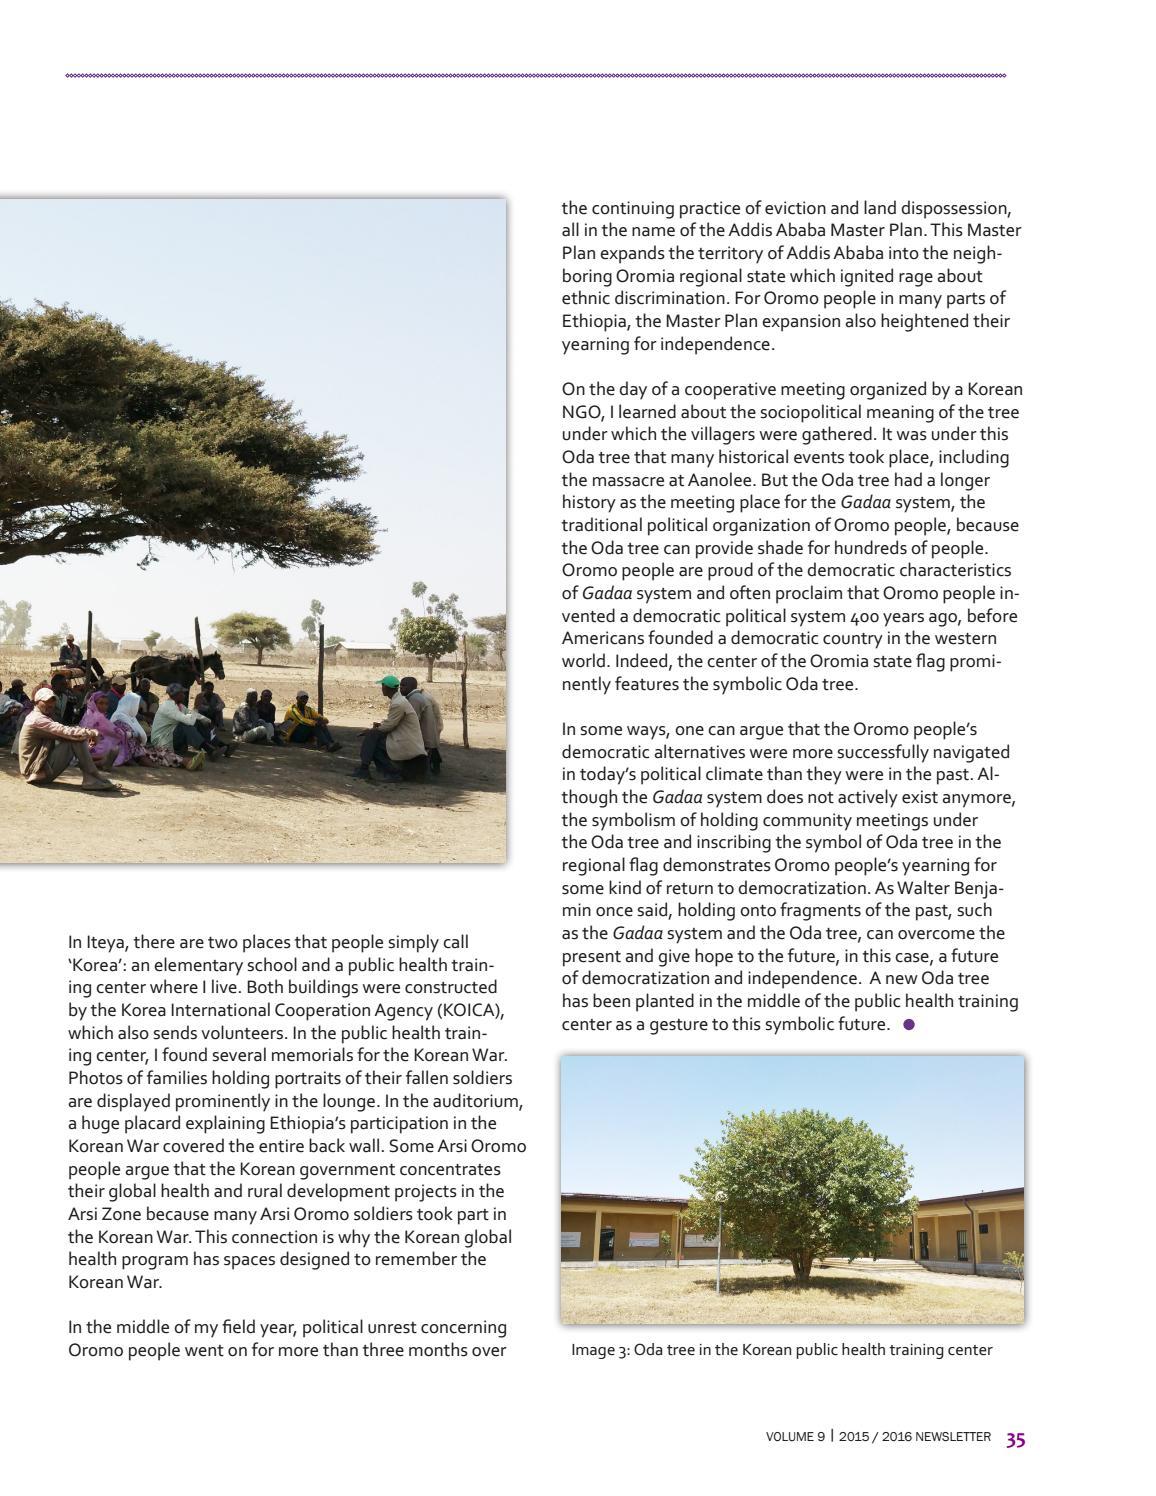 2016 Anthropology Newsletter, volume 9 by Stanford